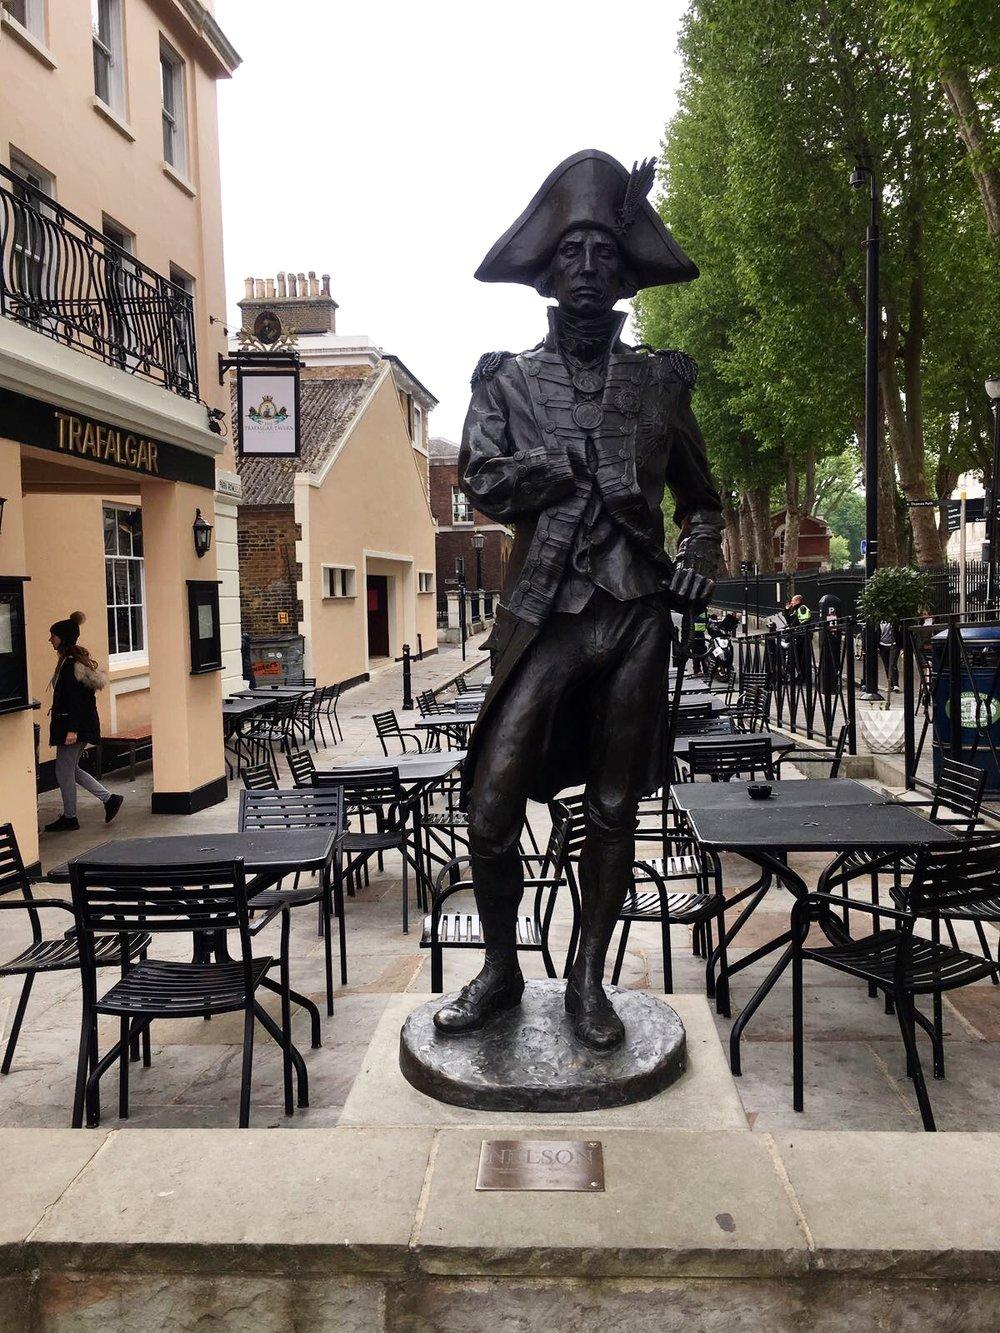 Nelson at The Trafalgar